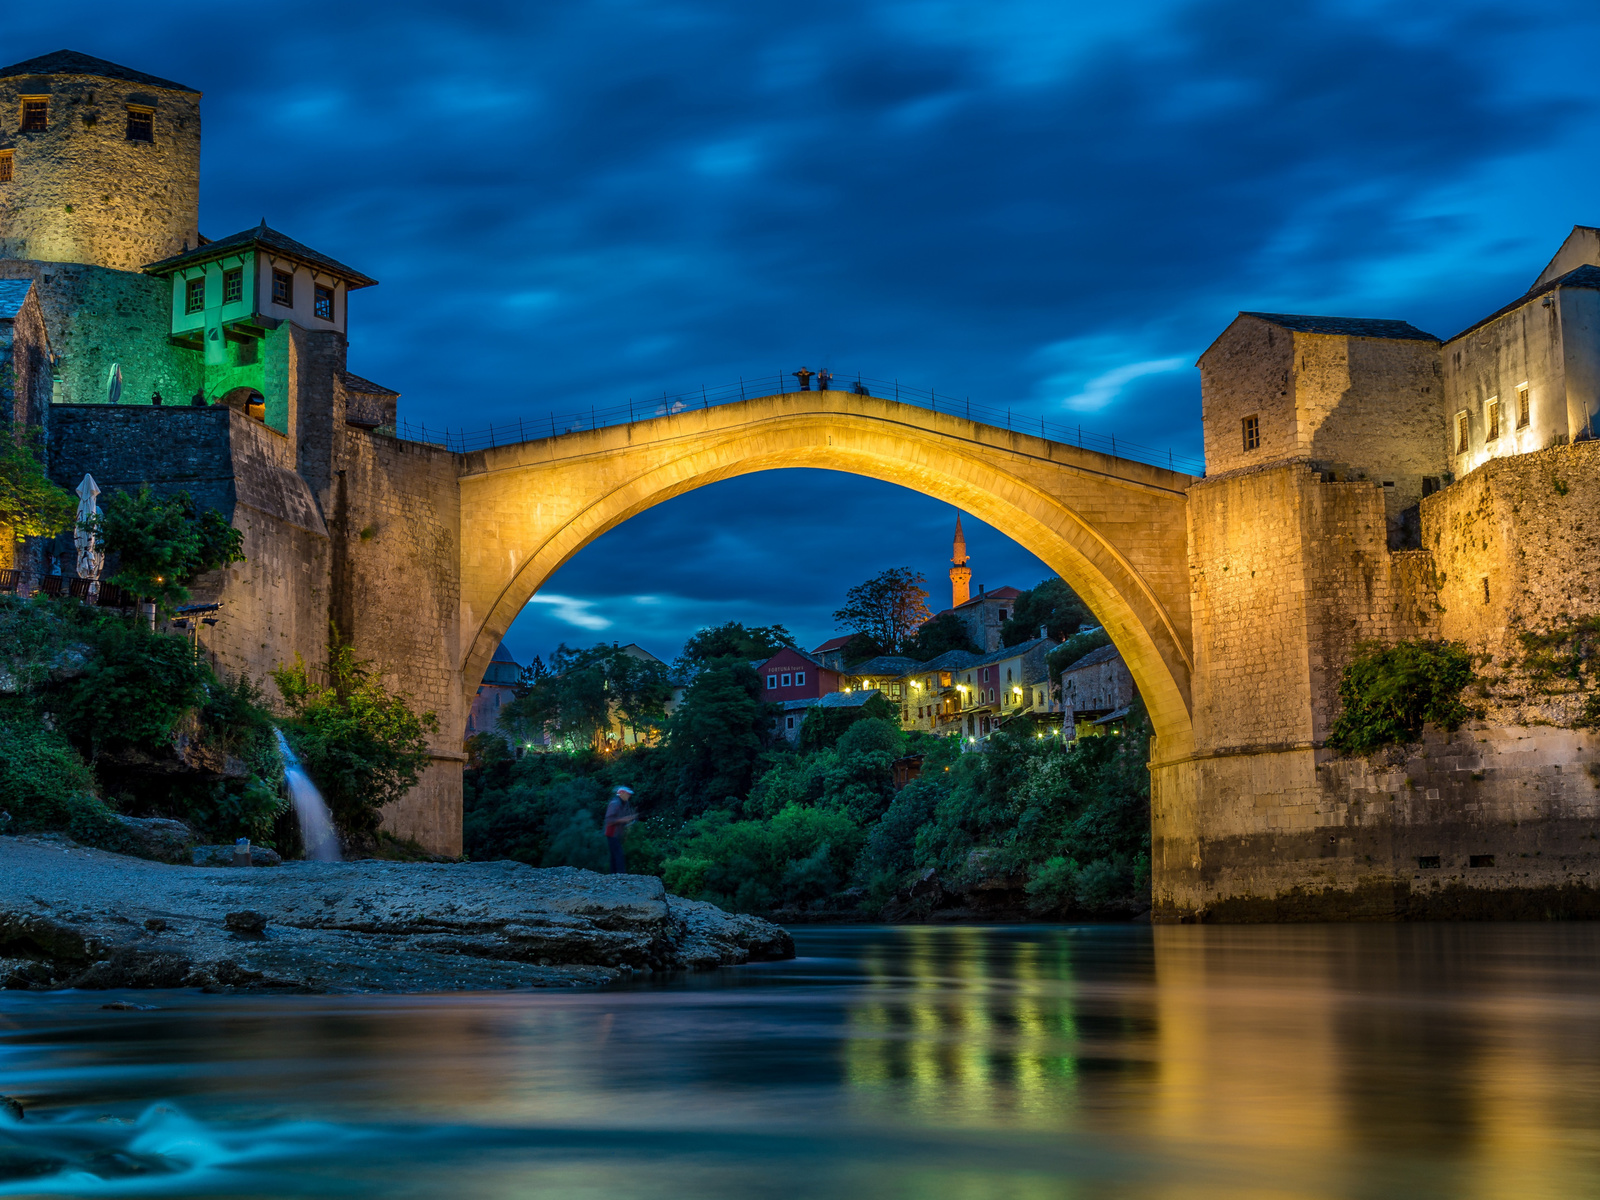 mostar, neretva river, evening, sunset, stone bridge, river, landmark, bosnia and herzegovina